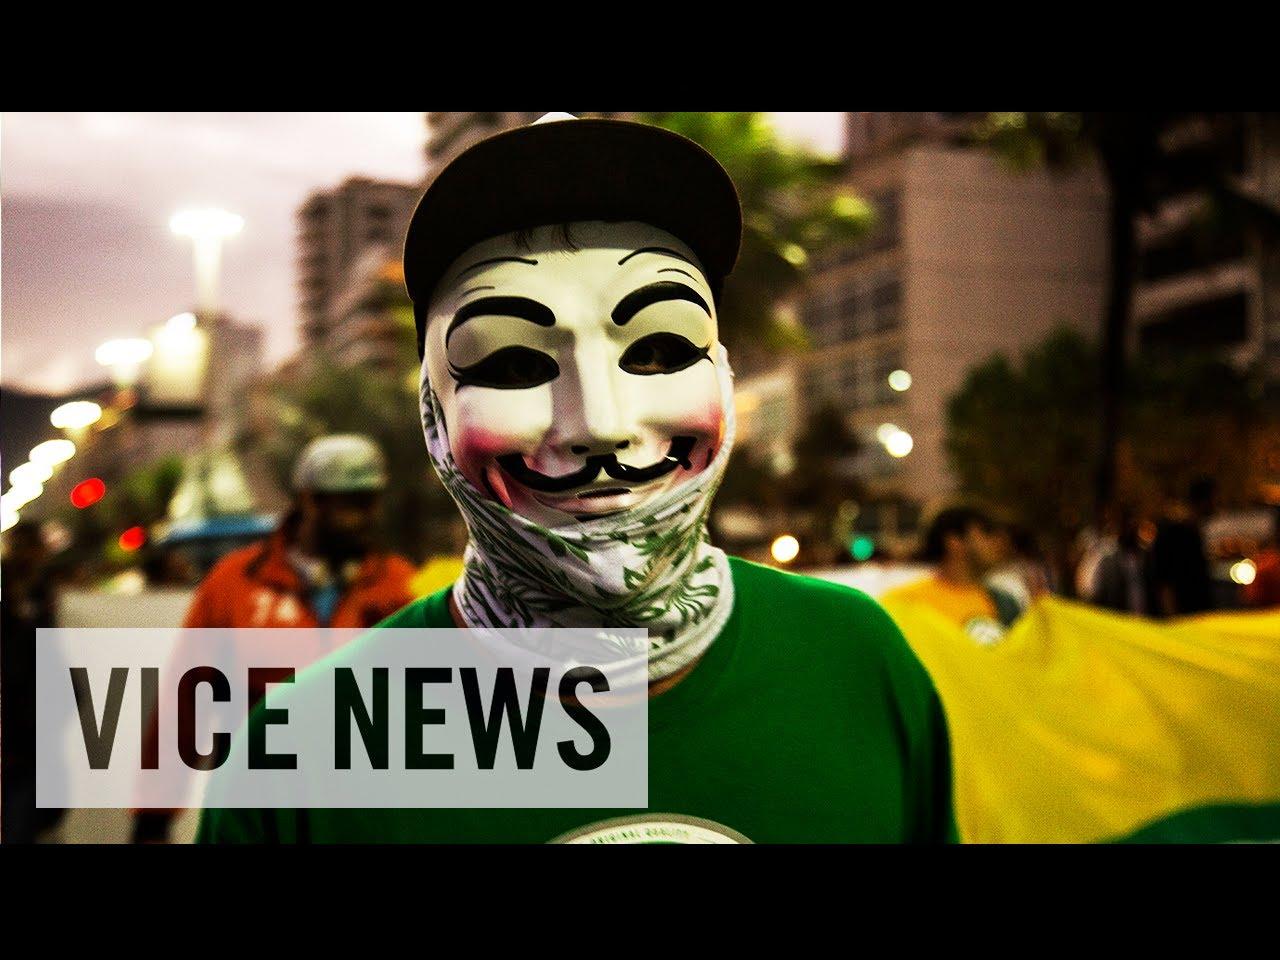 Two Vice News journalists freed in Turkey back in UK - Al Jazeera ...